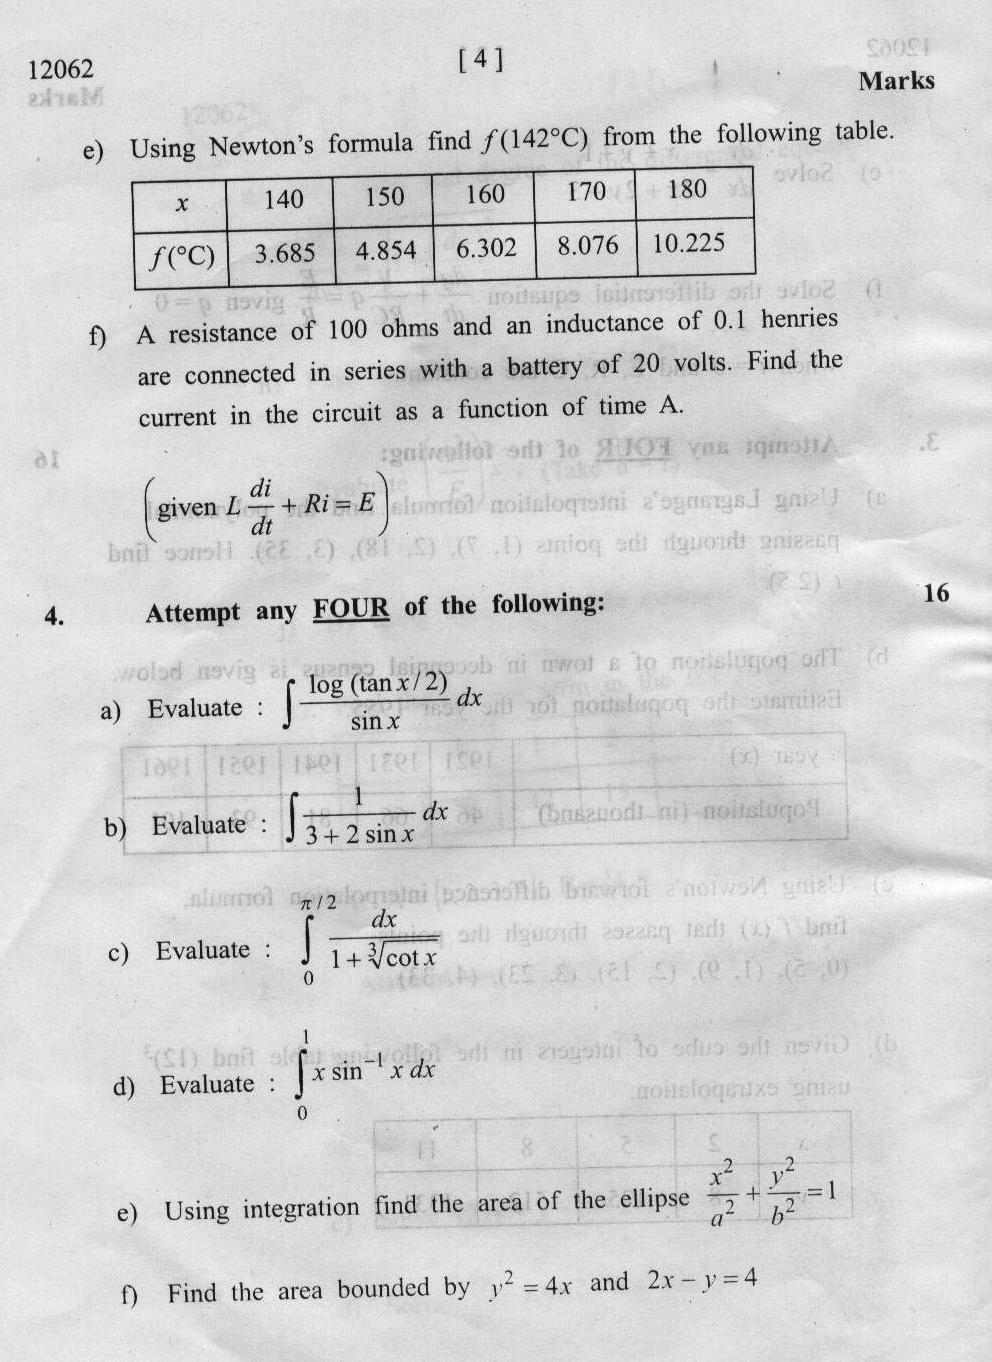 Maharashtra State Board of Technical Education MSBTE